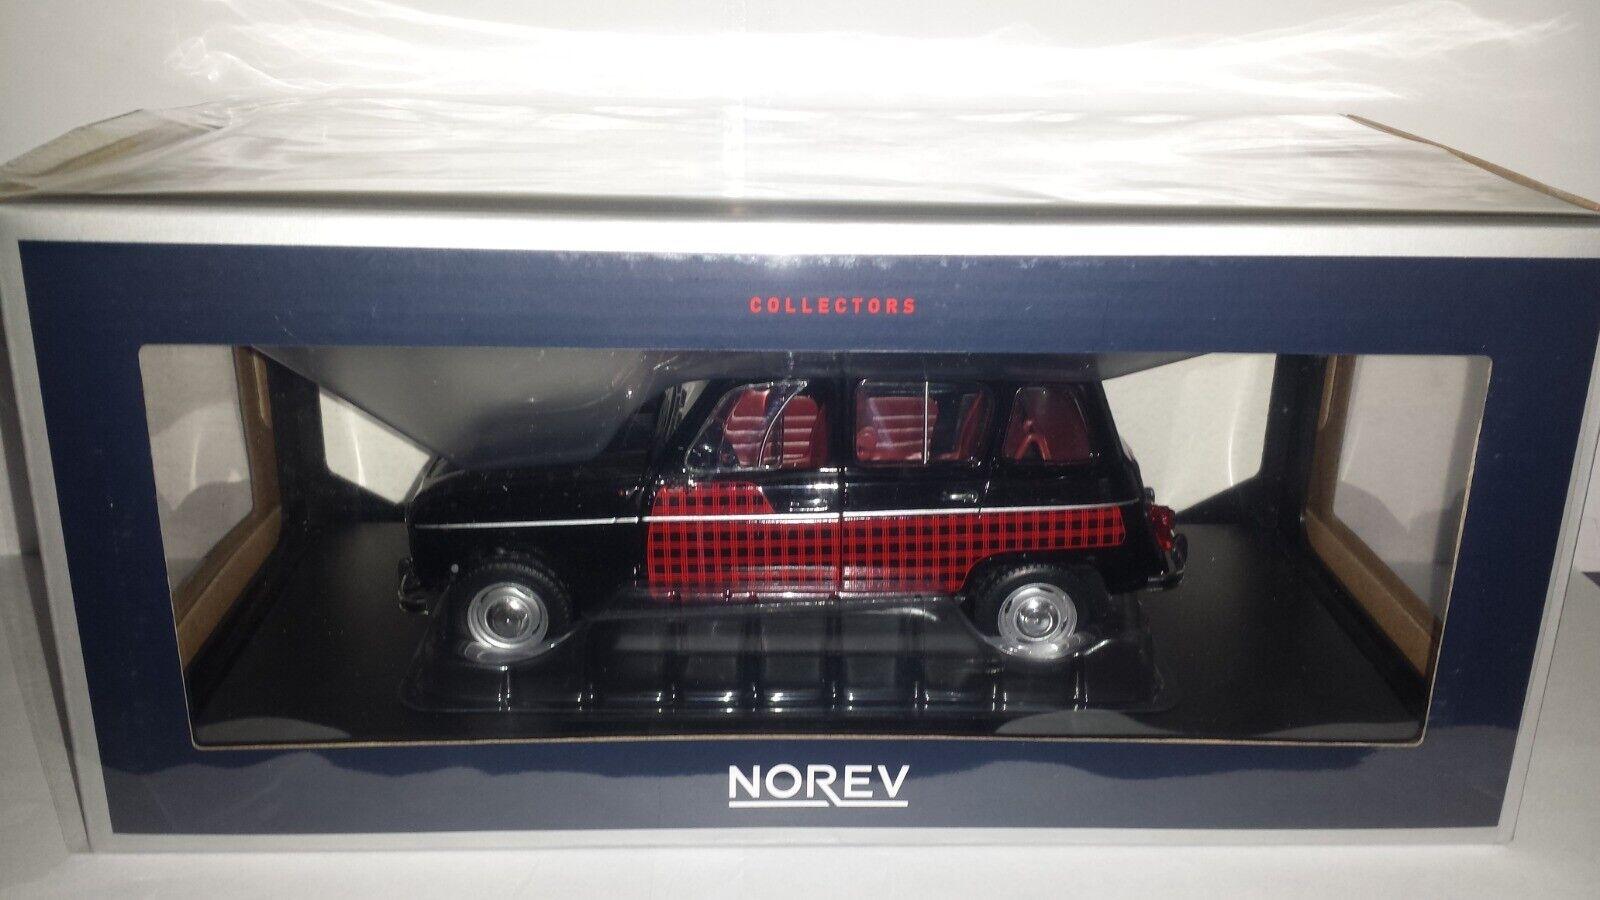 Offriamo vari marchi famosi Norev 1 18 Renault 4 Parisienne 1964 nieuw in in in doos  scelta migliore